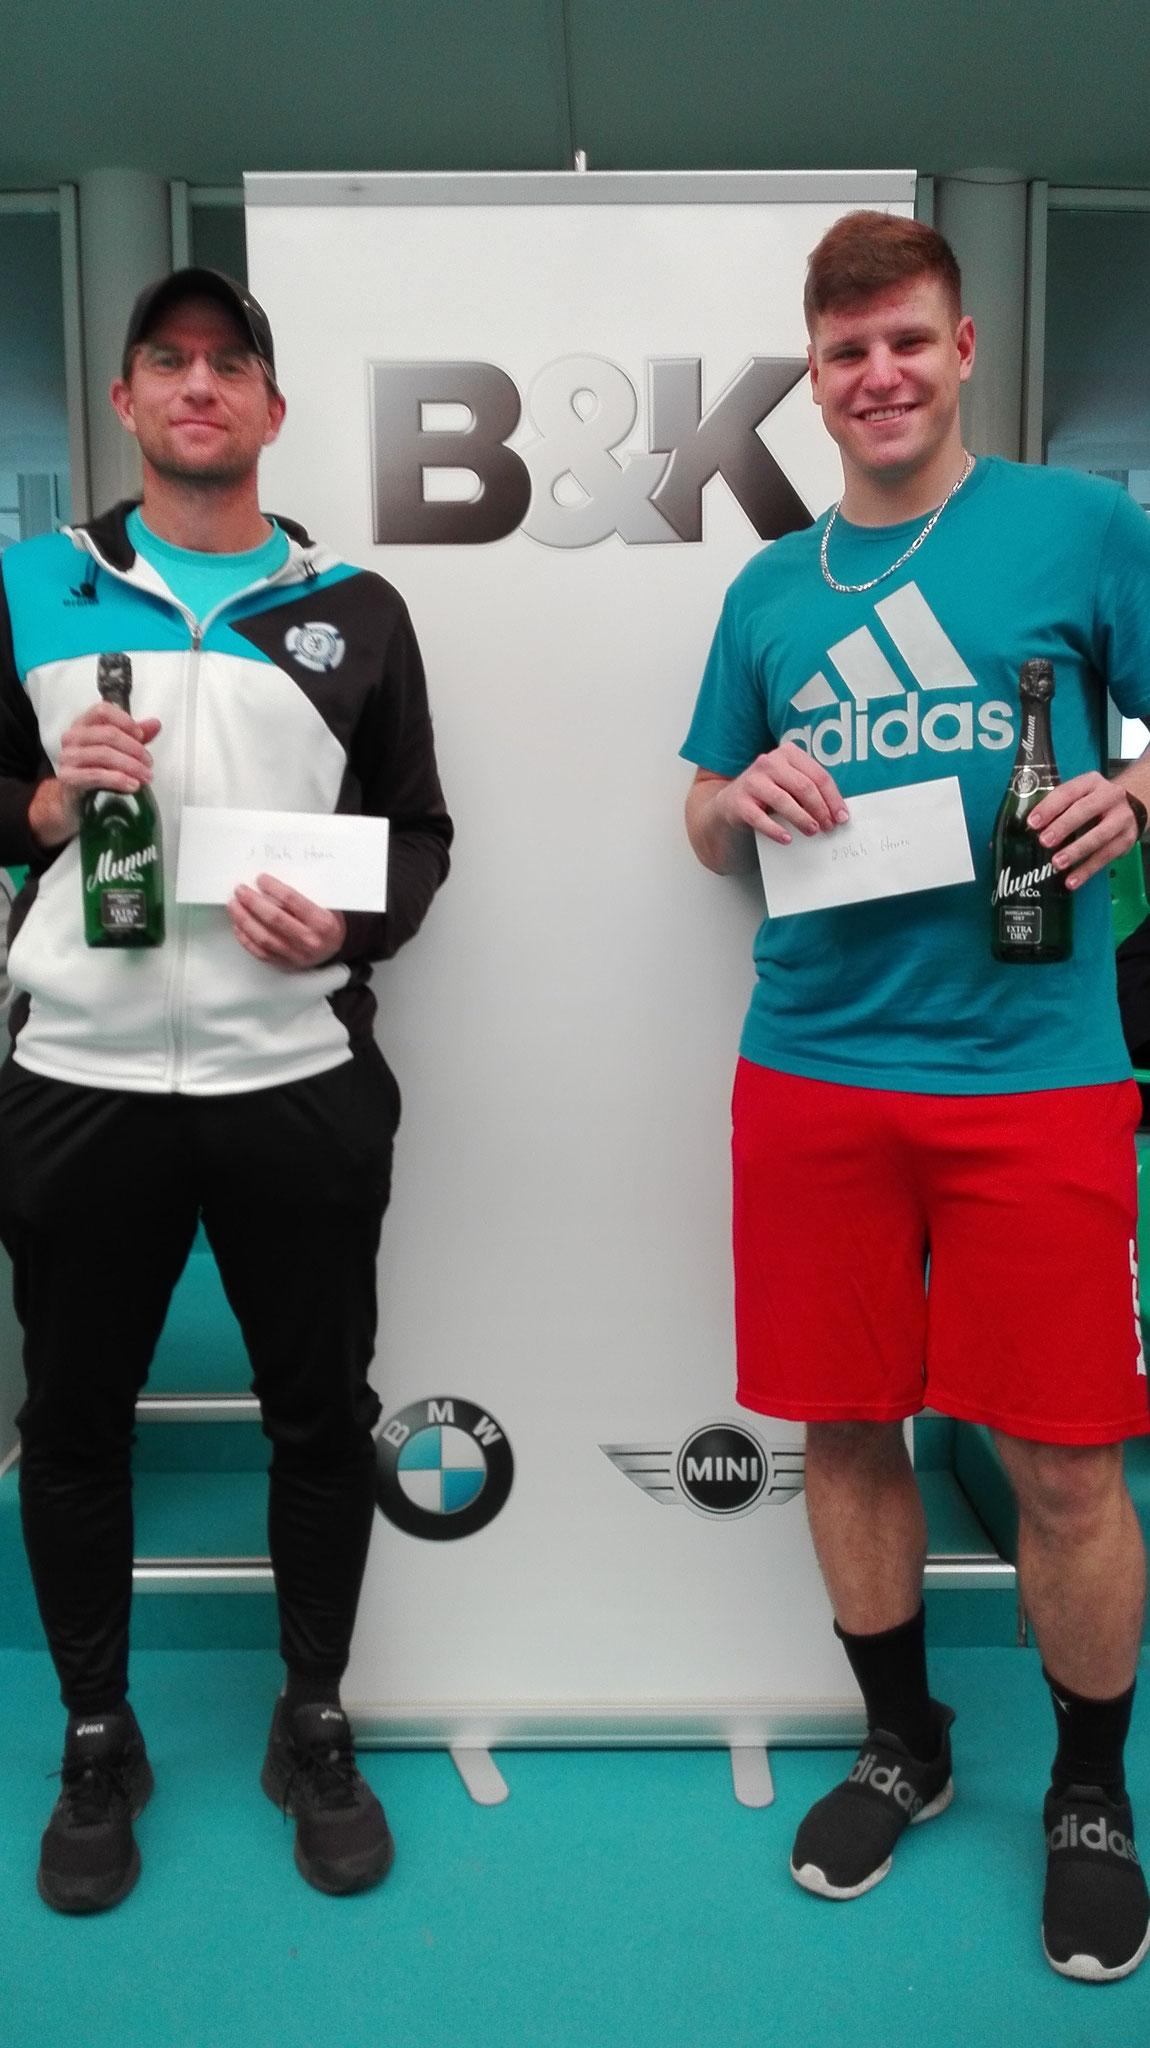 Finalisten bei den Herren: Daniel Höppner und  Linus Holthey. Sieger : Daniel Höppner